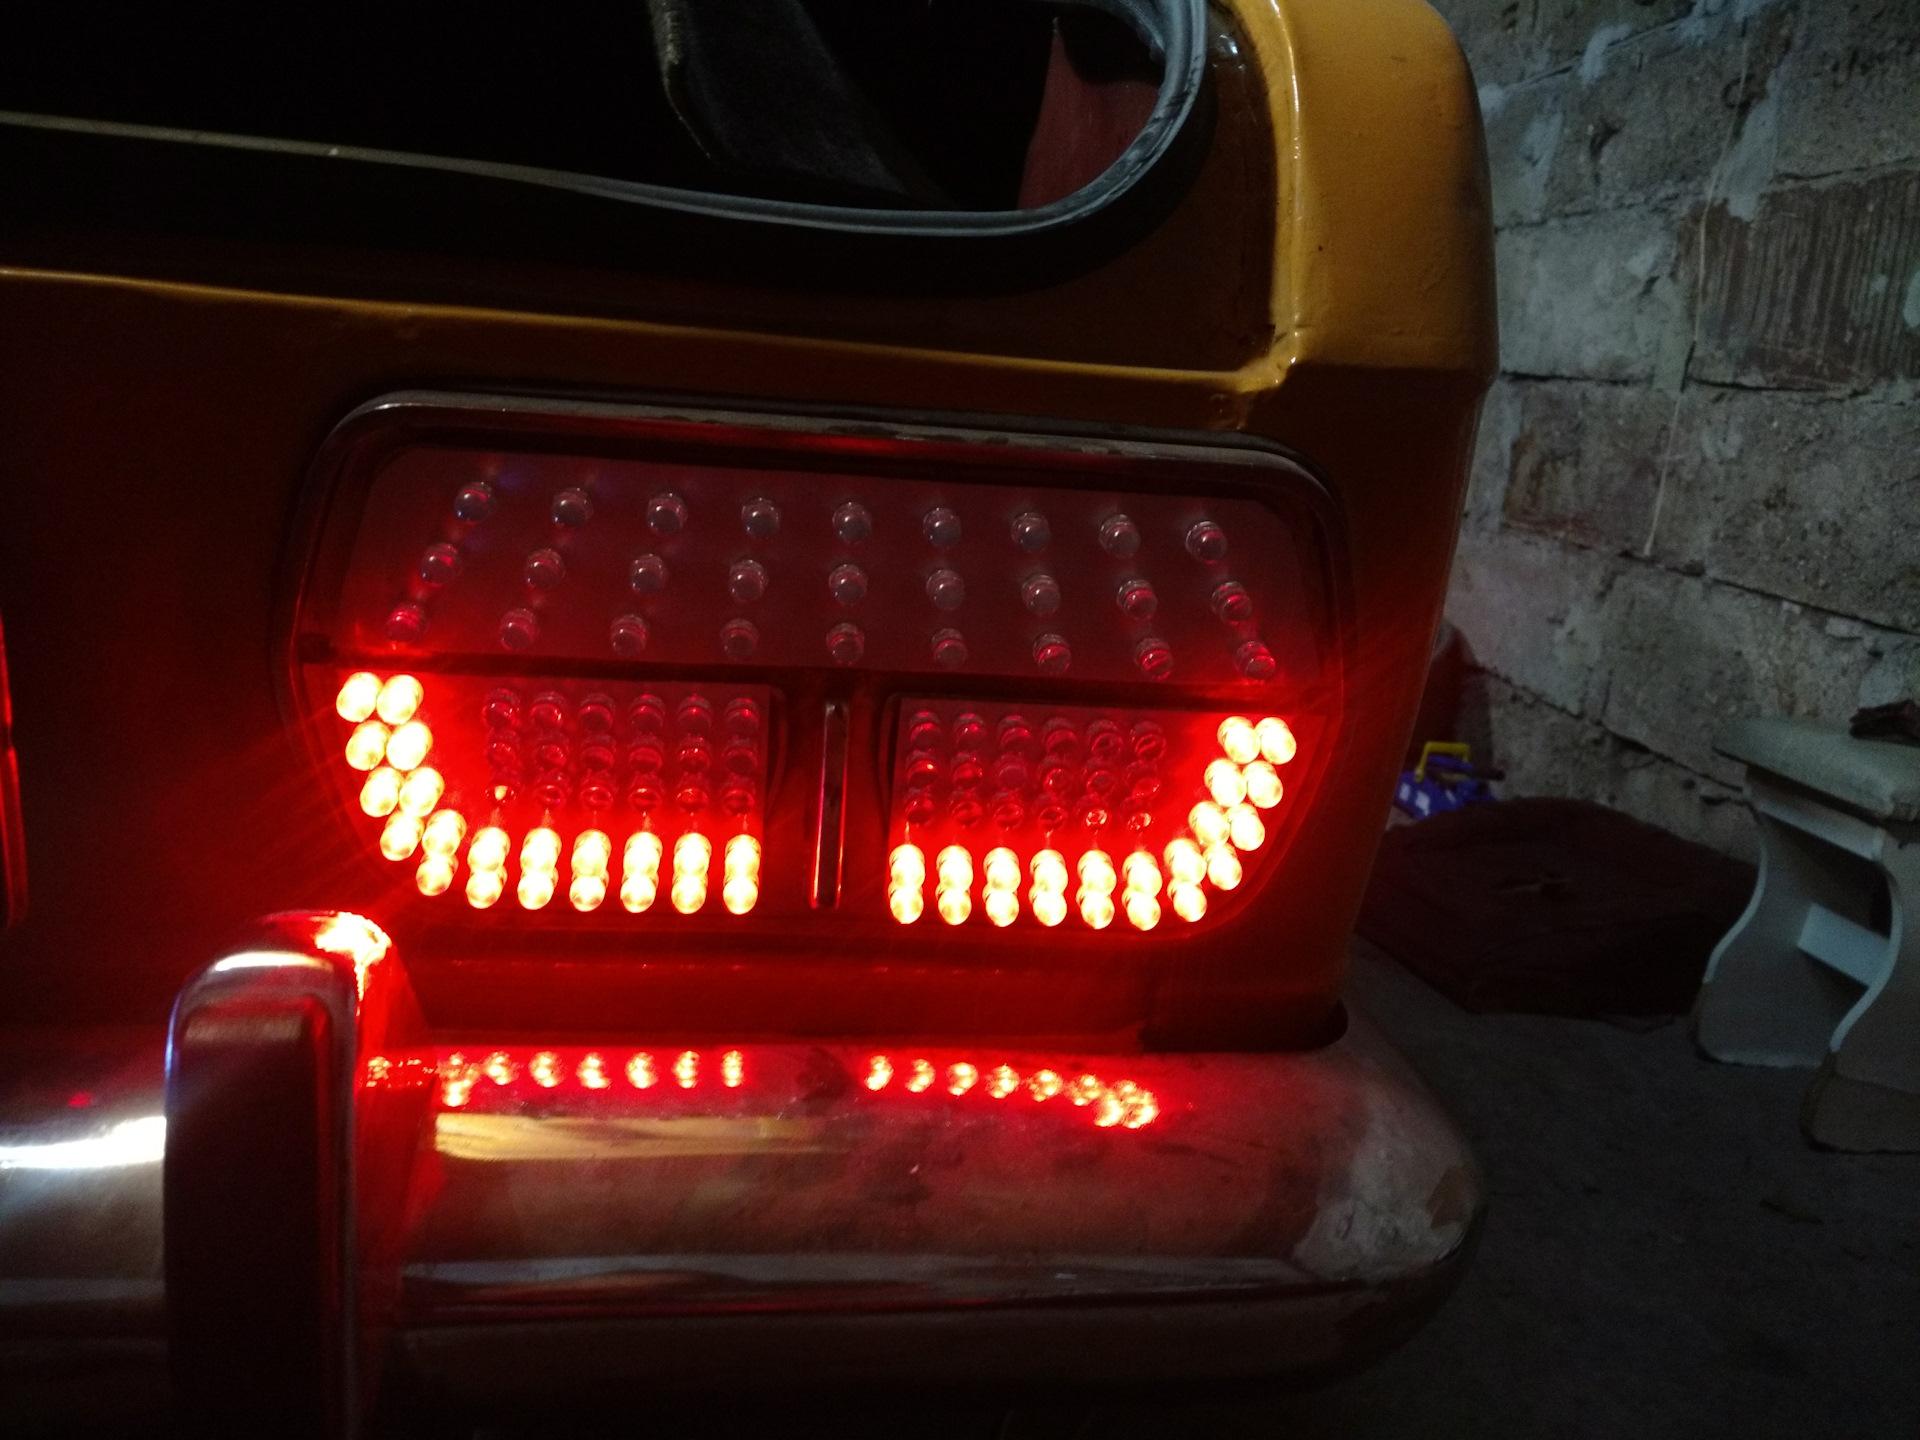 тюнинговые фонари на газ фото колесниченко